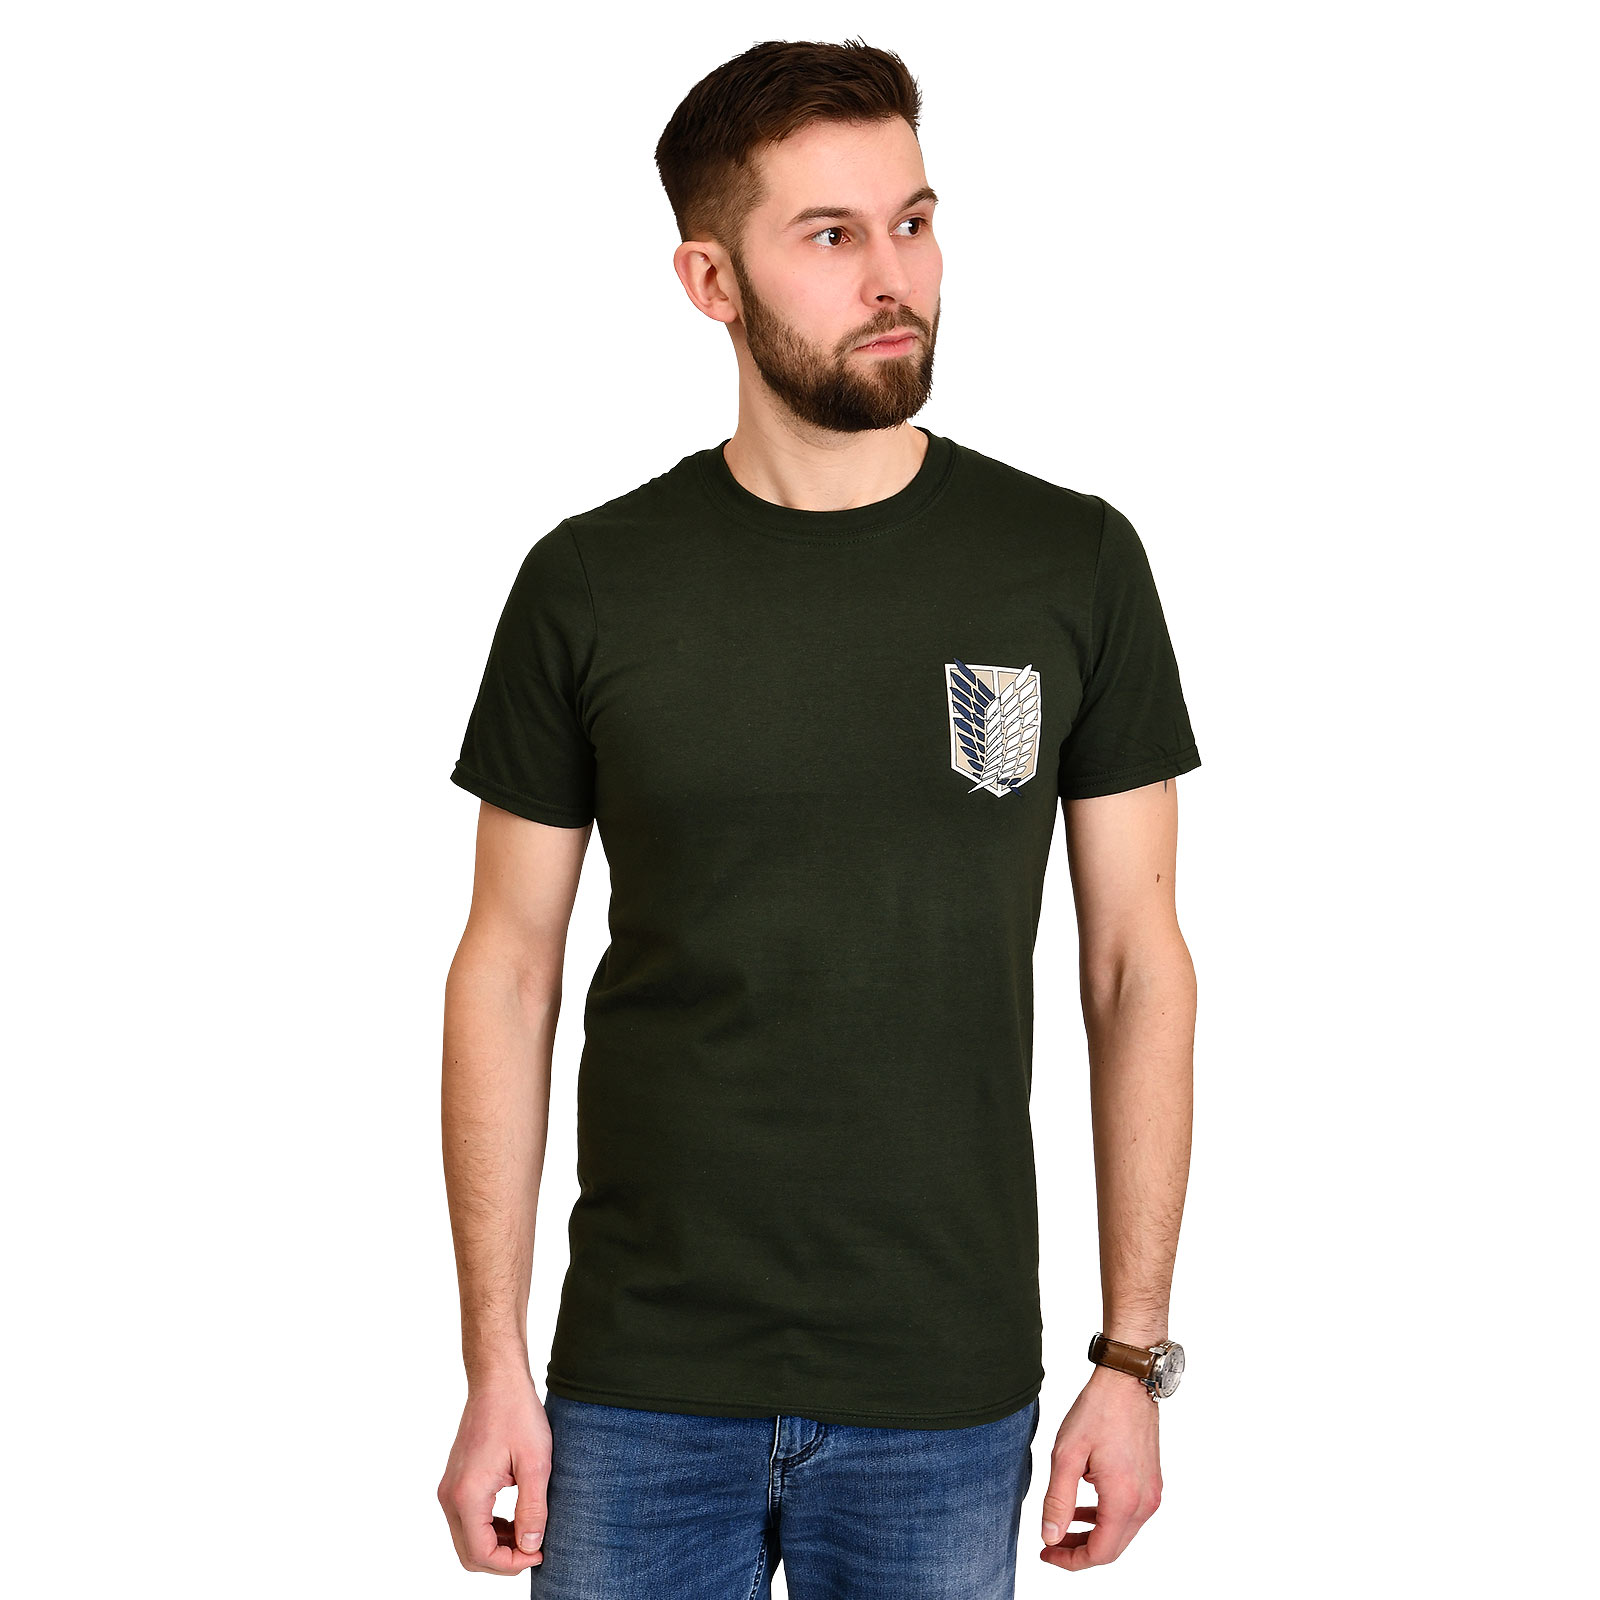 Attack on Titan - Survey Corps T-Shirt grün